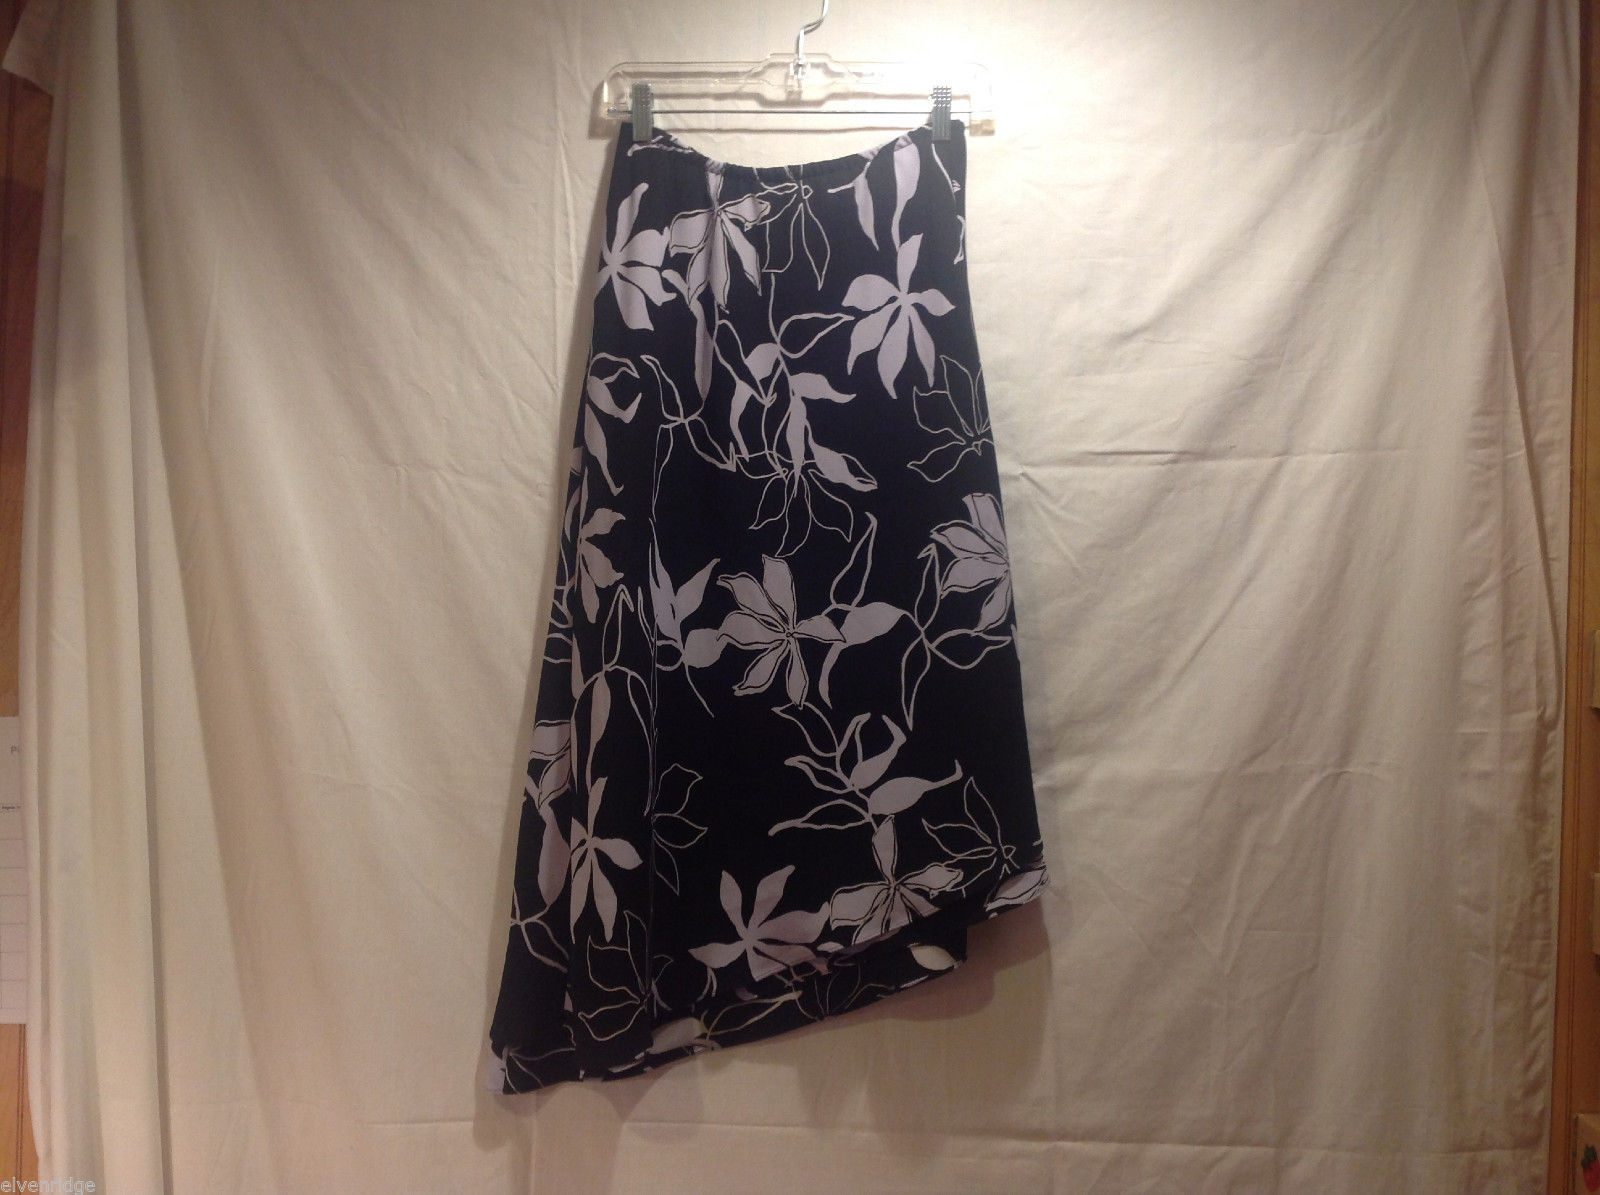 Long Asymmetrical Bottom Print Skirt Black White Floral Double Layered, Size 10